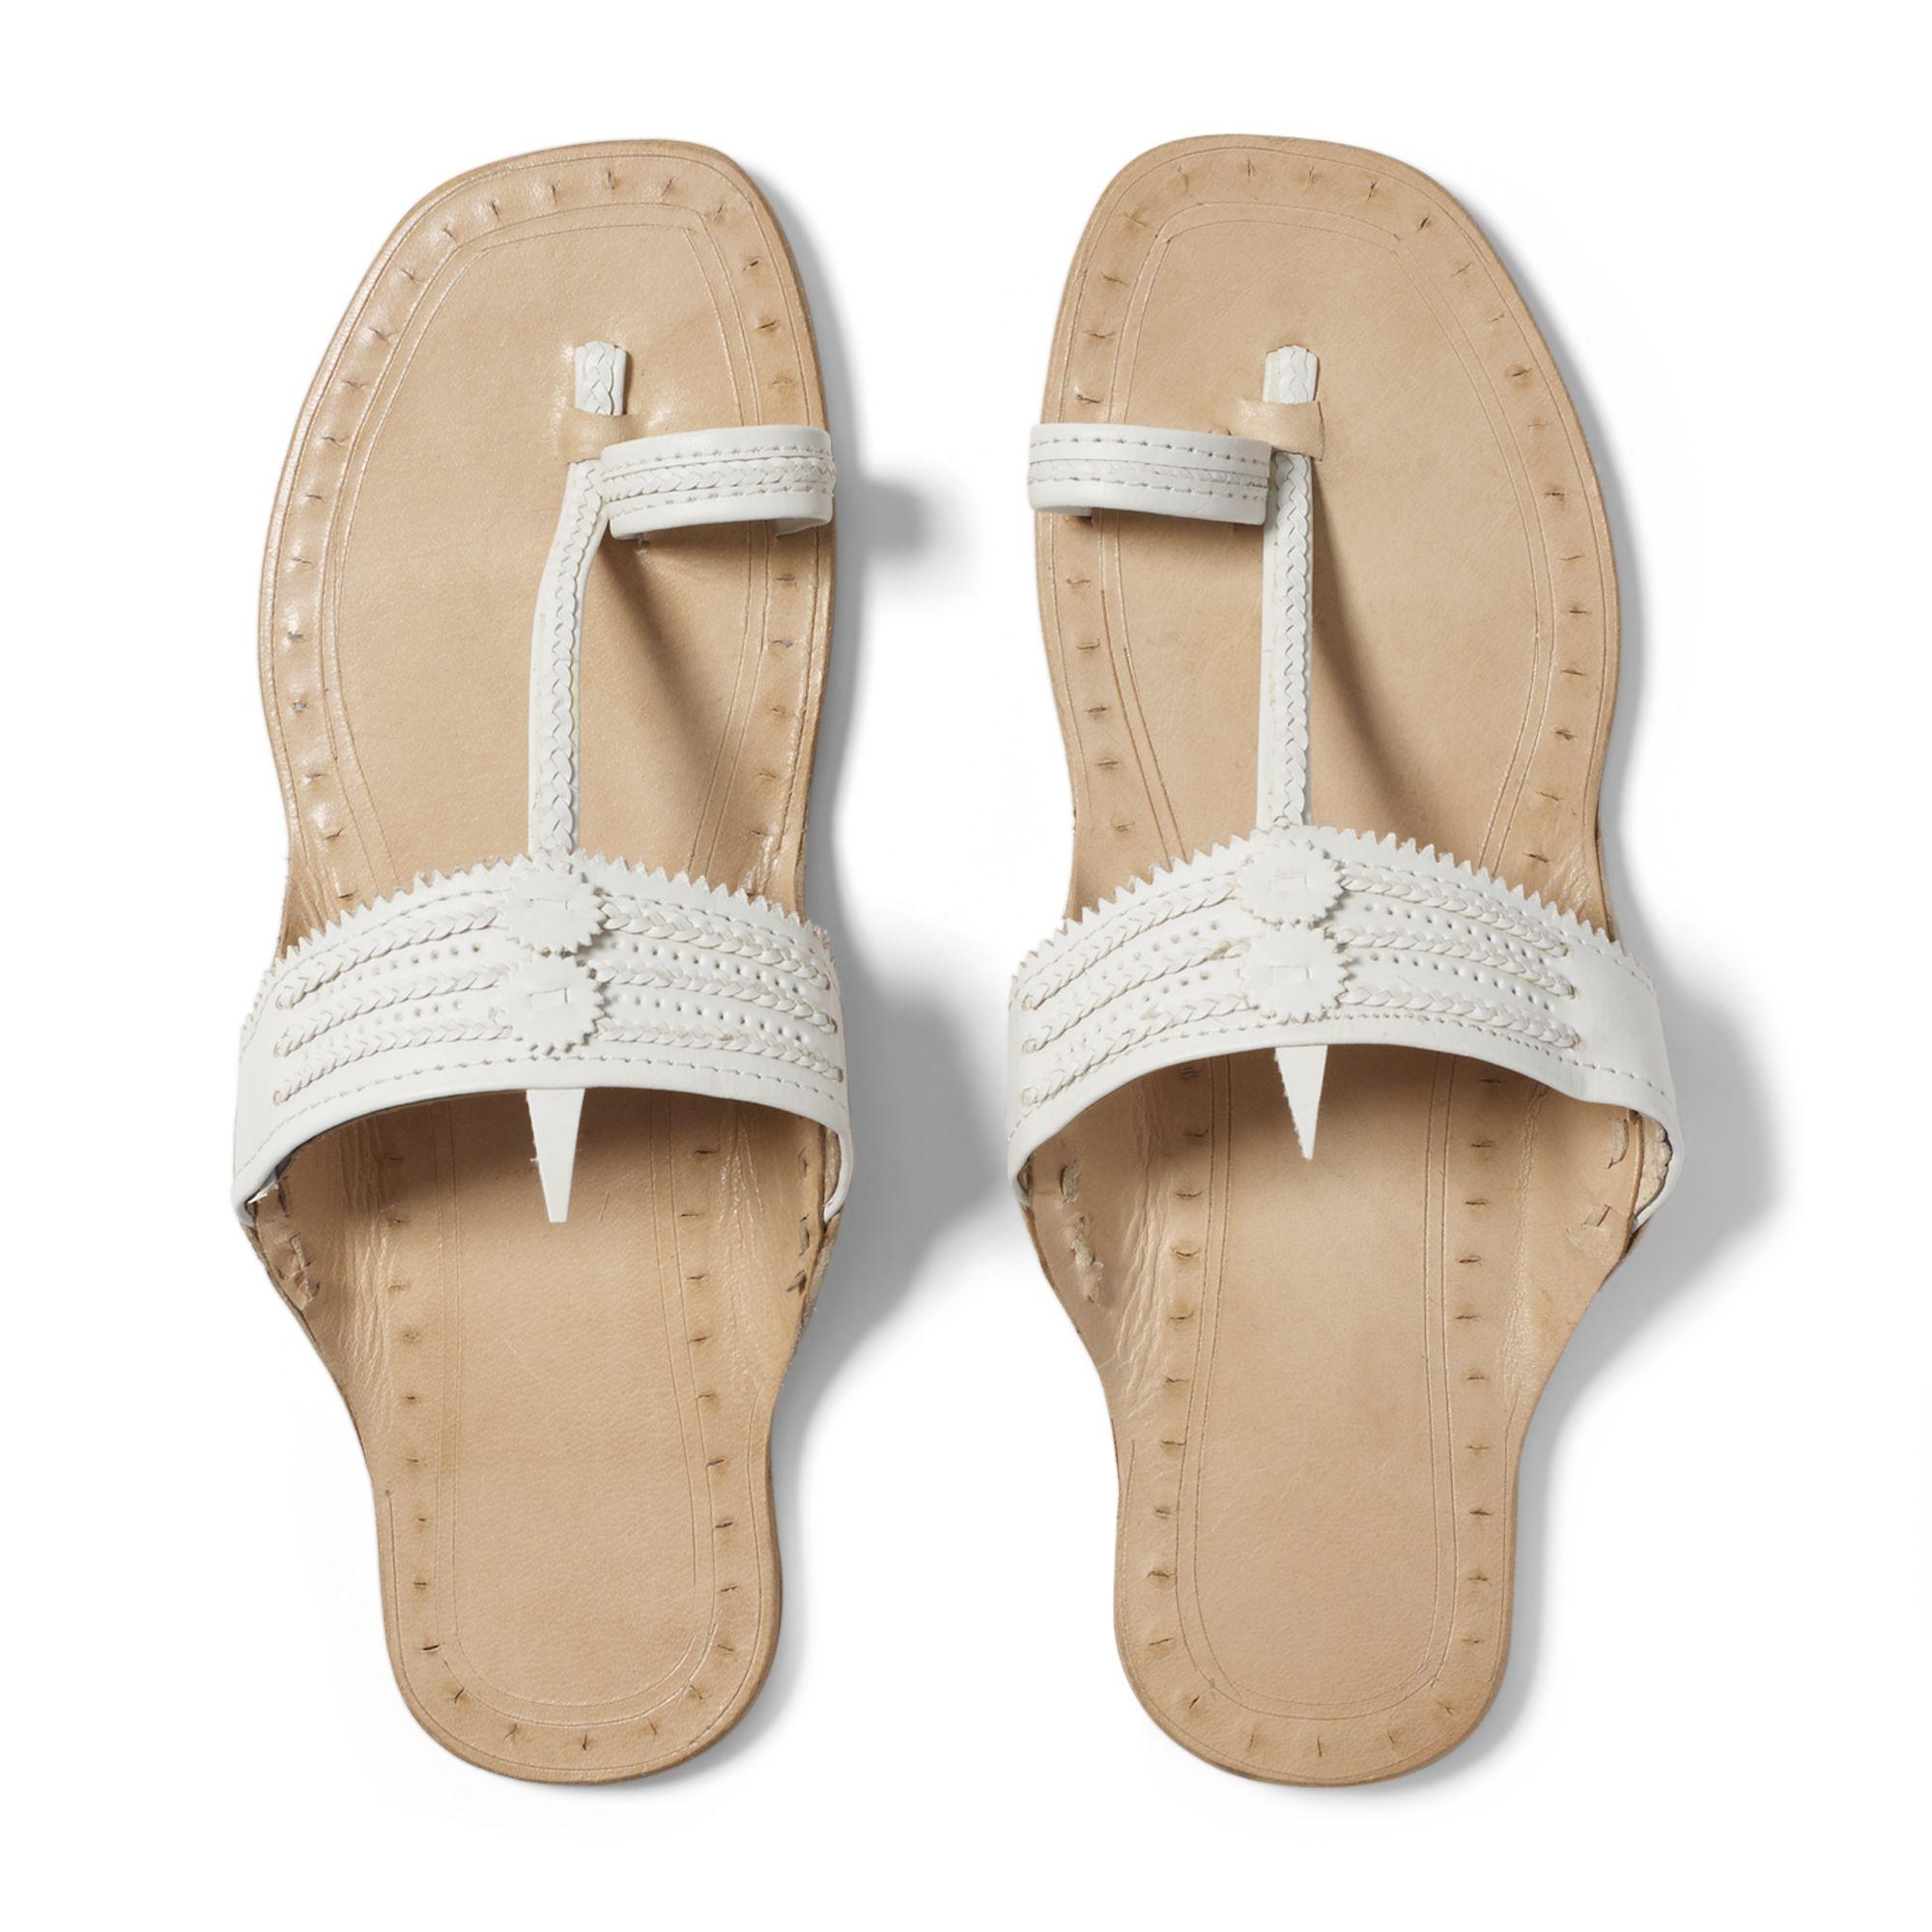 7d8249e30cabb0 Lyst - Club Monaco Indian Sandals in White